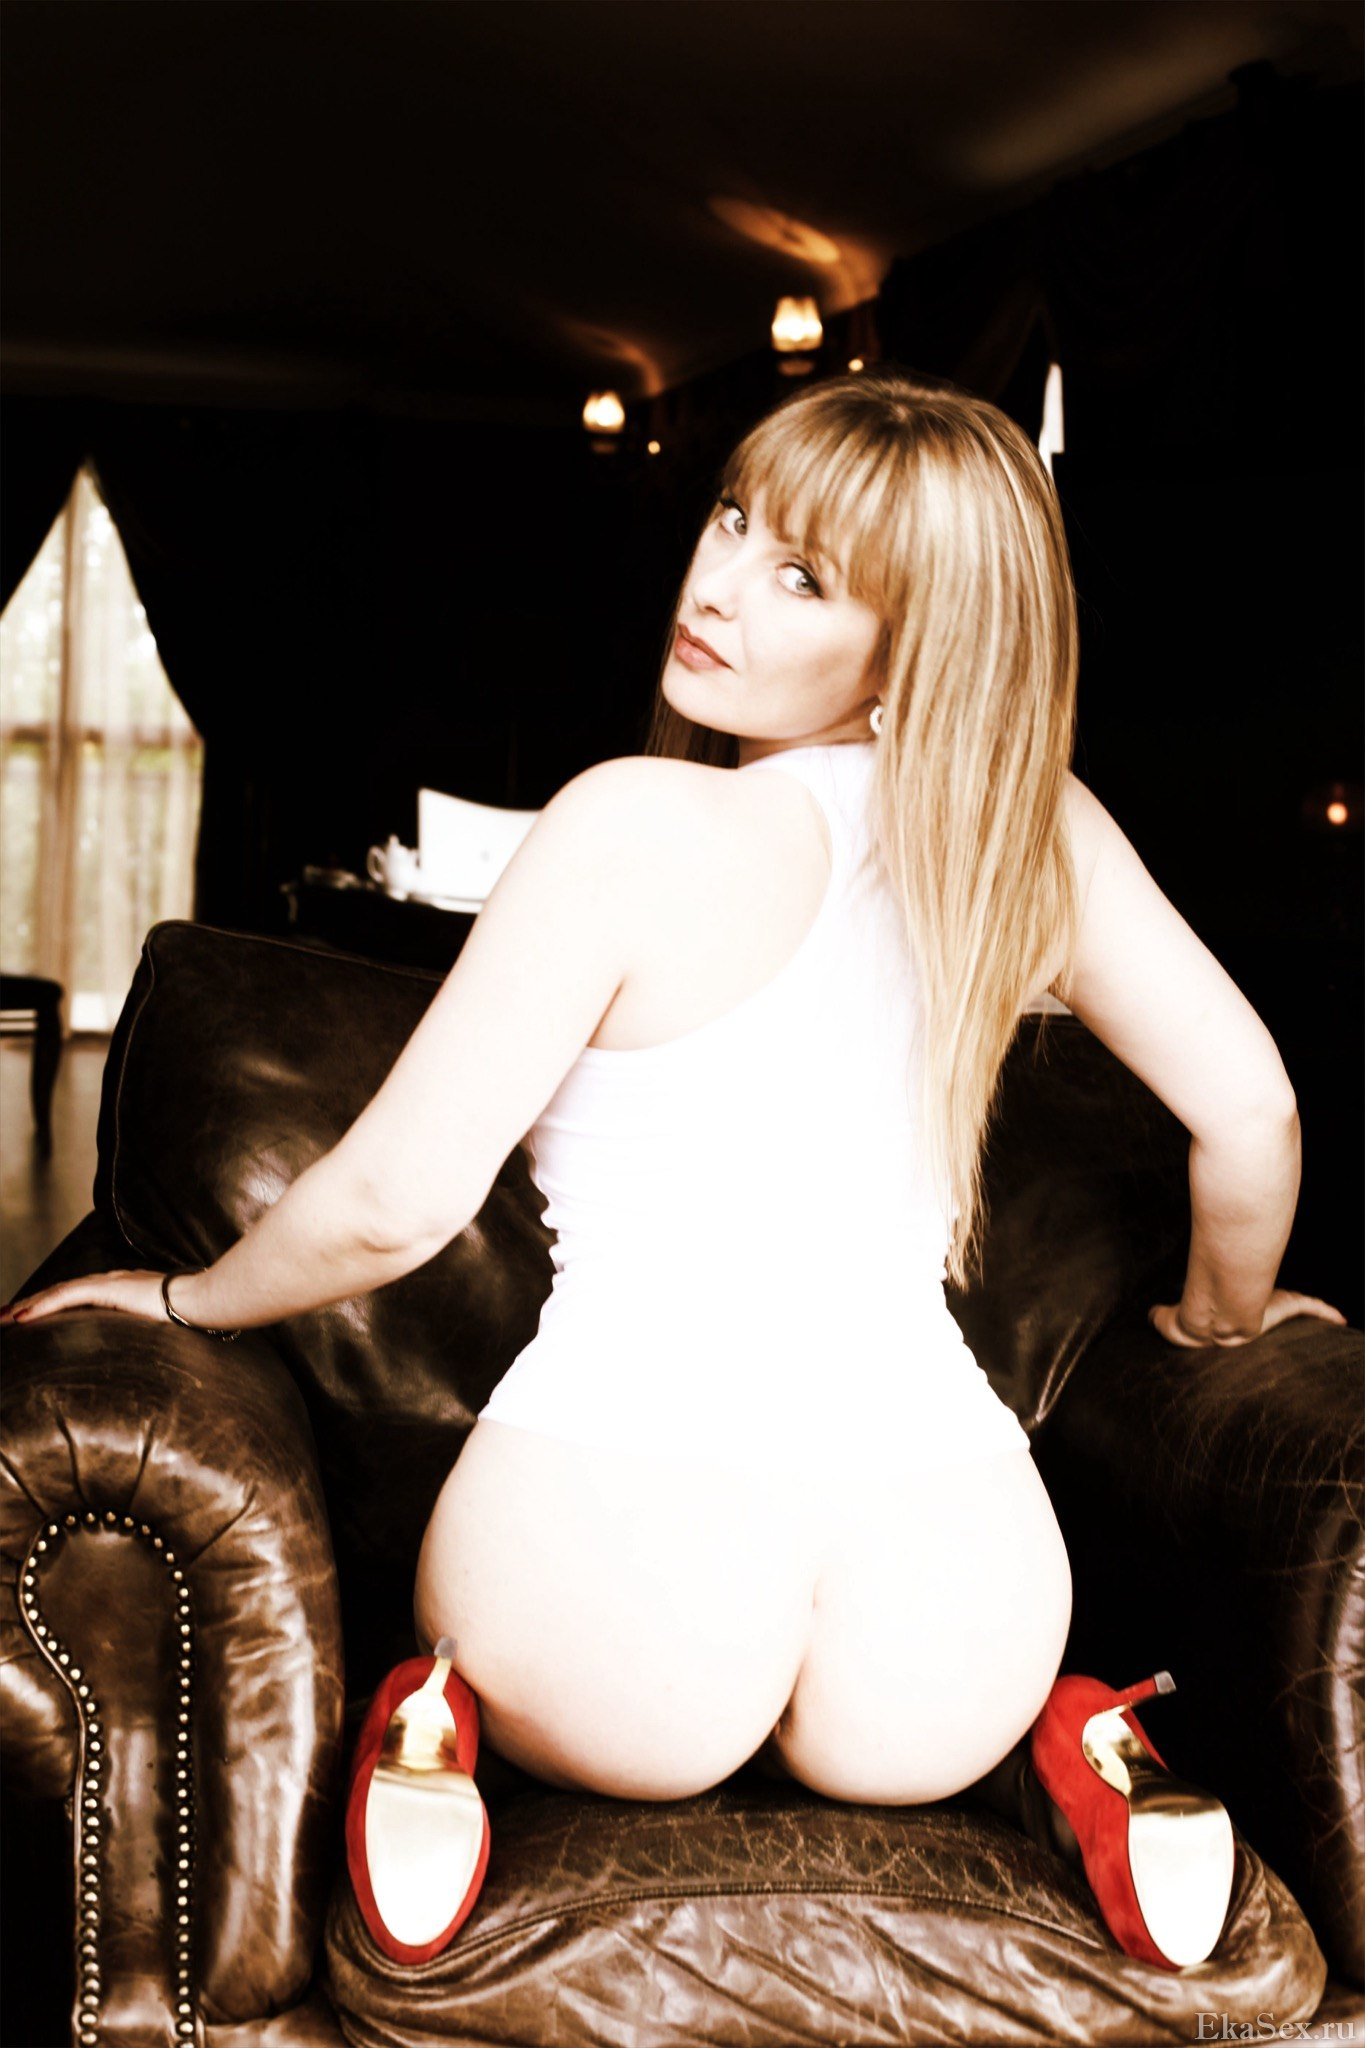 фото проститутки Алёна из города Екатеринбург